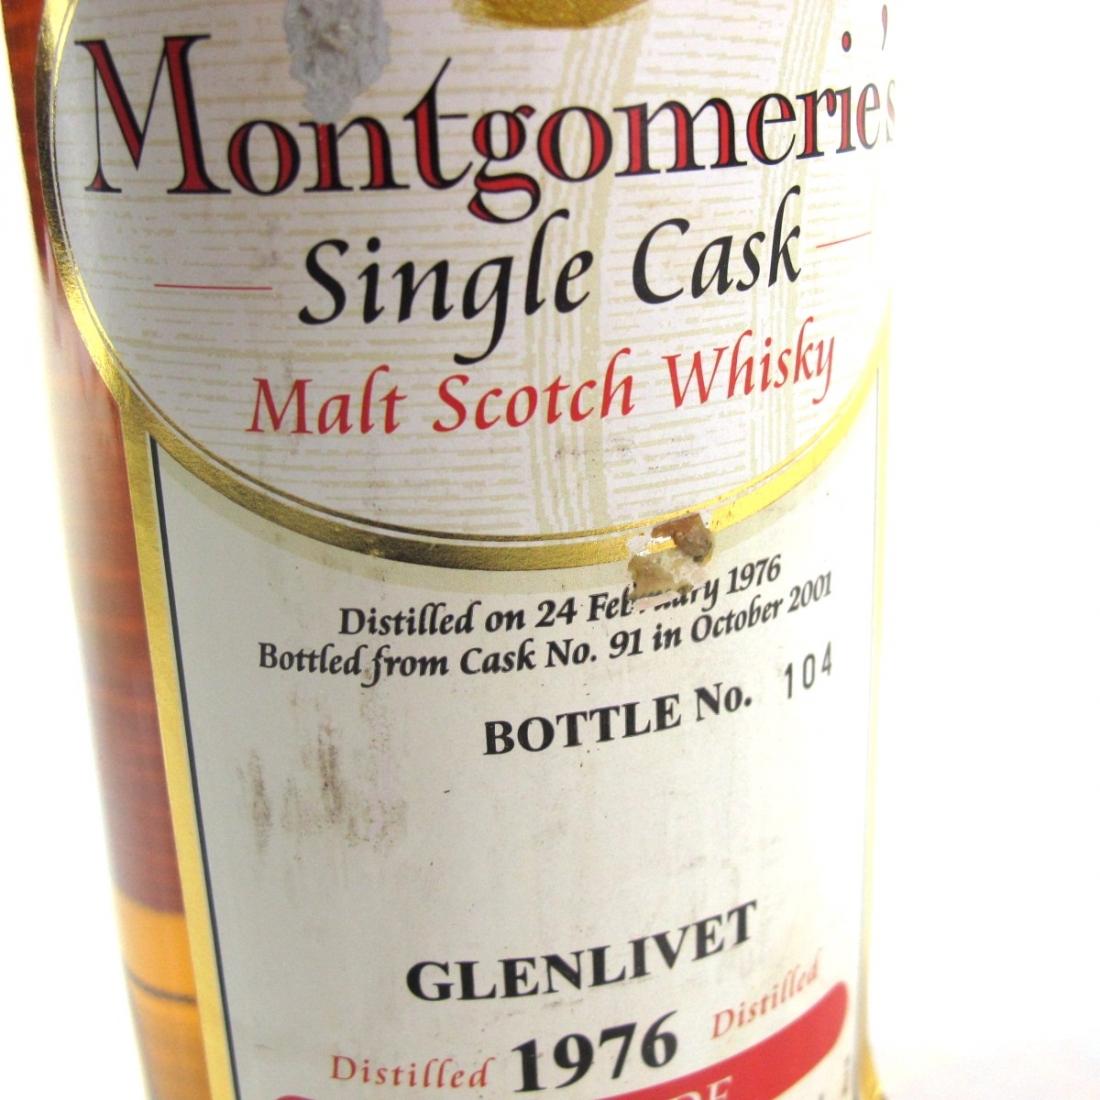 Glenlivet 1976 Montgomerie's Single Cask